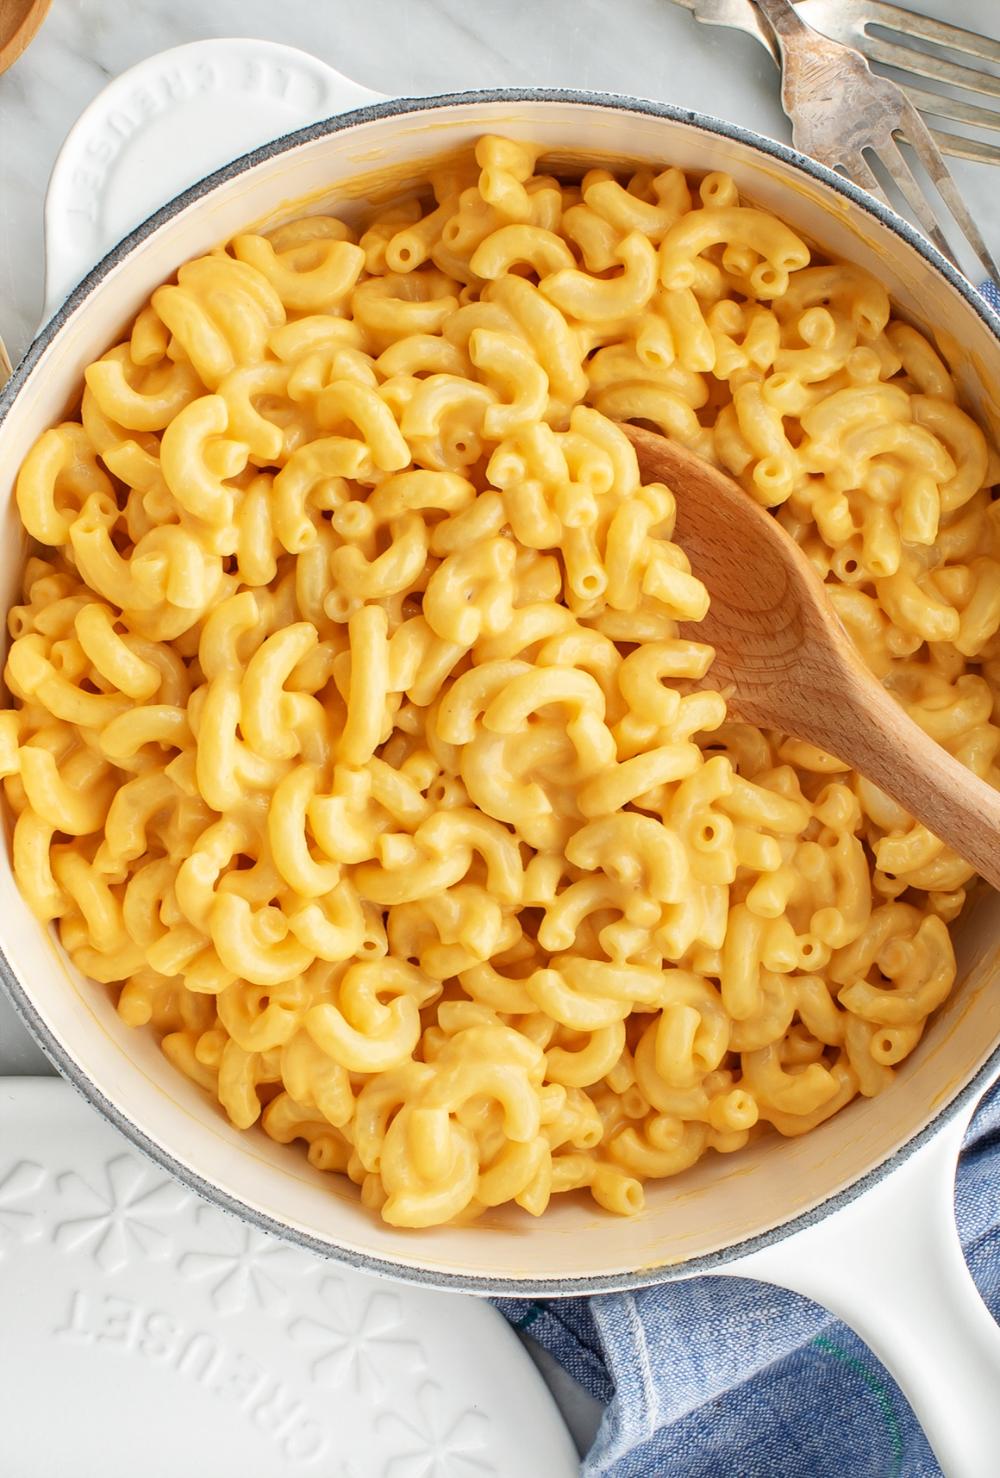 Vegan Mac And Cheese Recipe Love And Lemons Recipe In 2020 Vegan Mac And Cheese Mac And Cheese Yummy Pasta Recipes